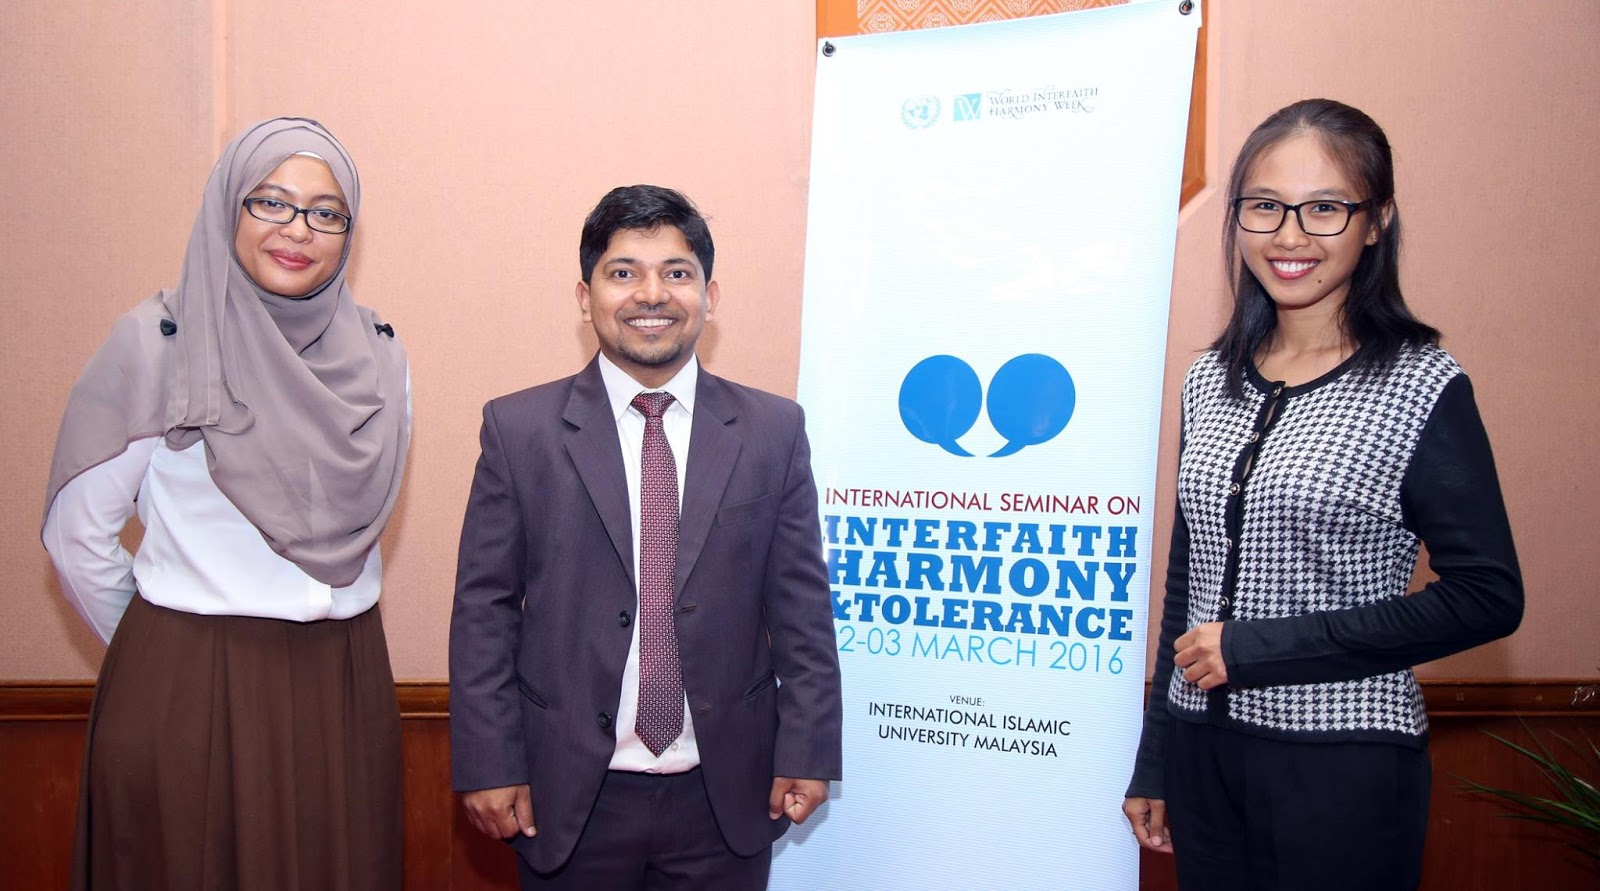 International Seminar on Interfaith Harmony and Tolerance 2016 in Kuala Lumpur, March 2-3